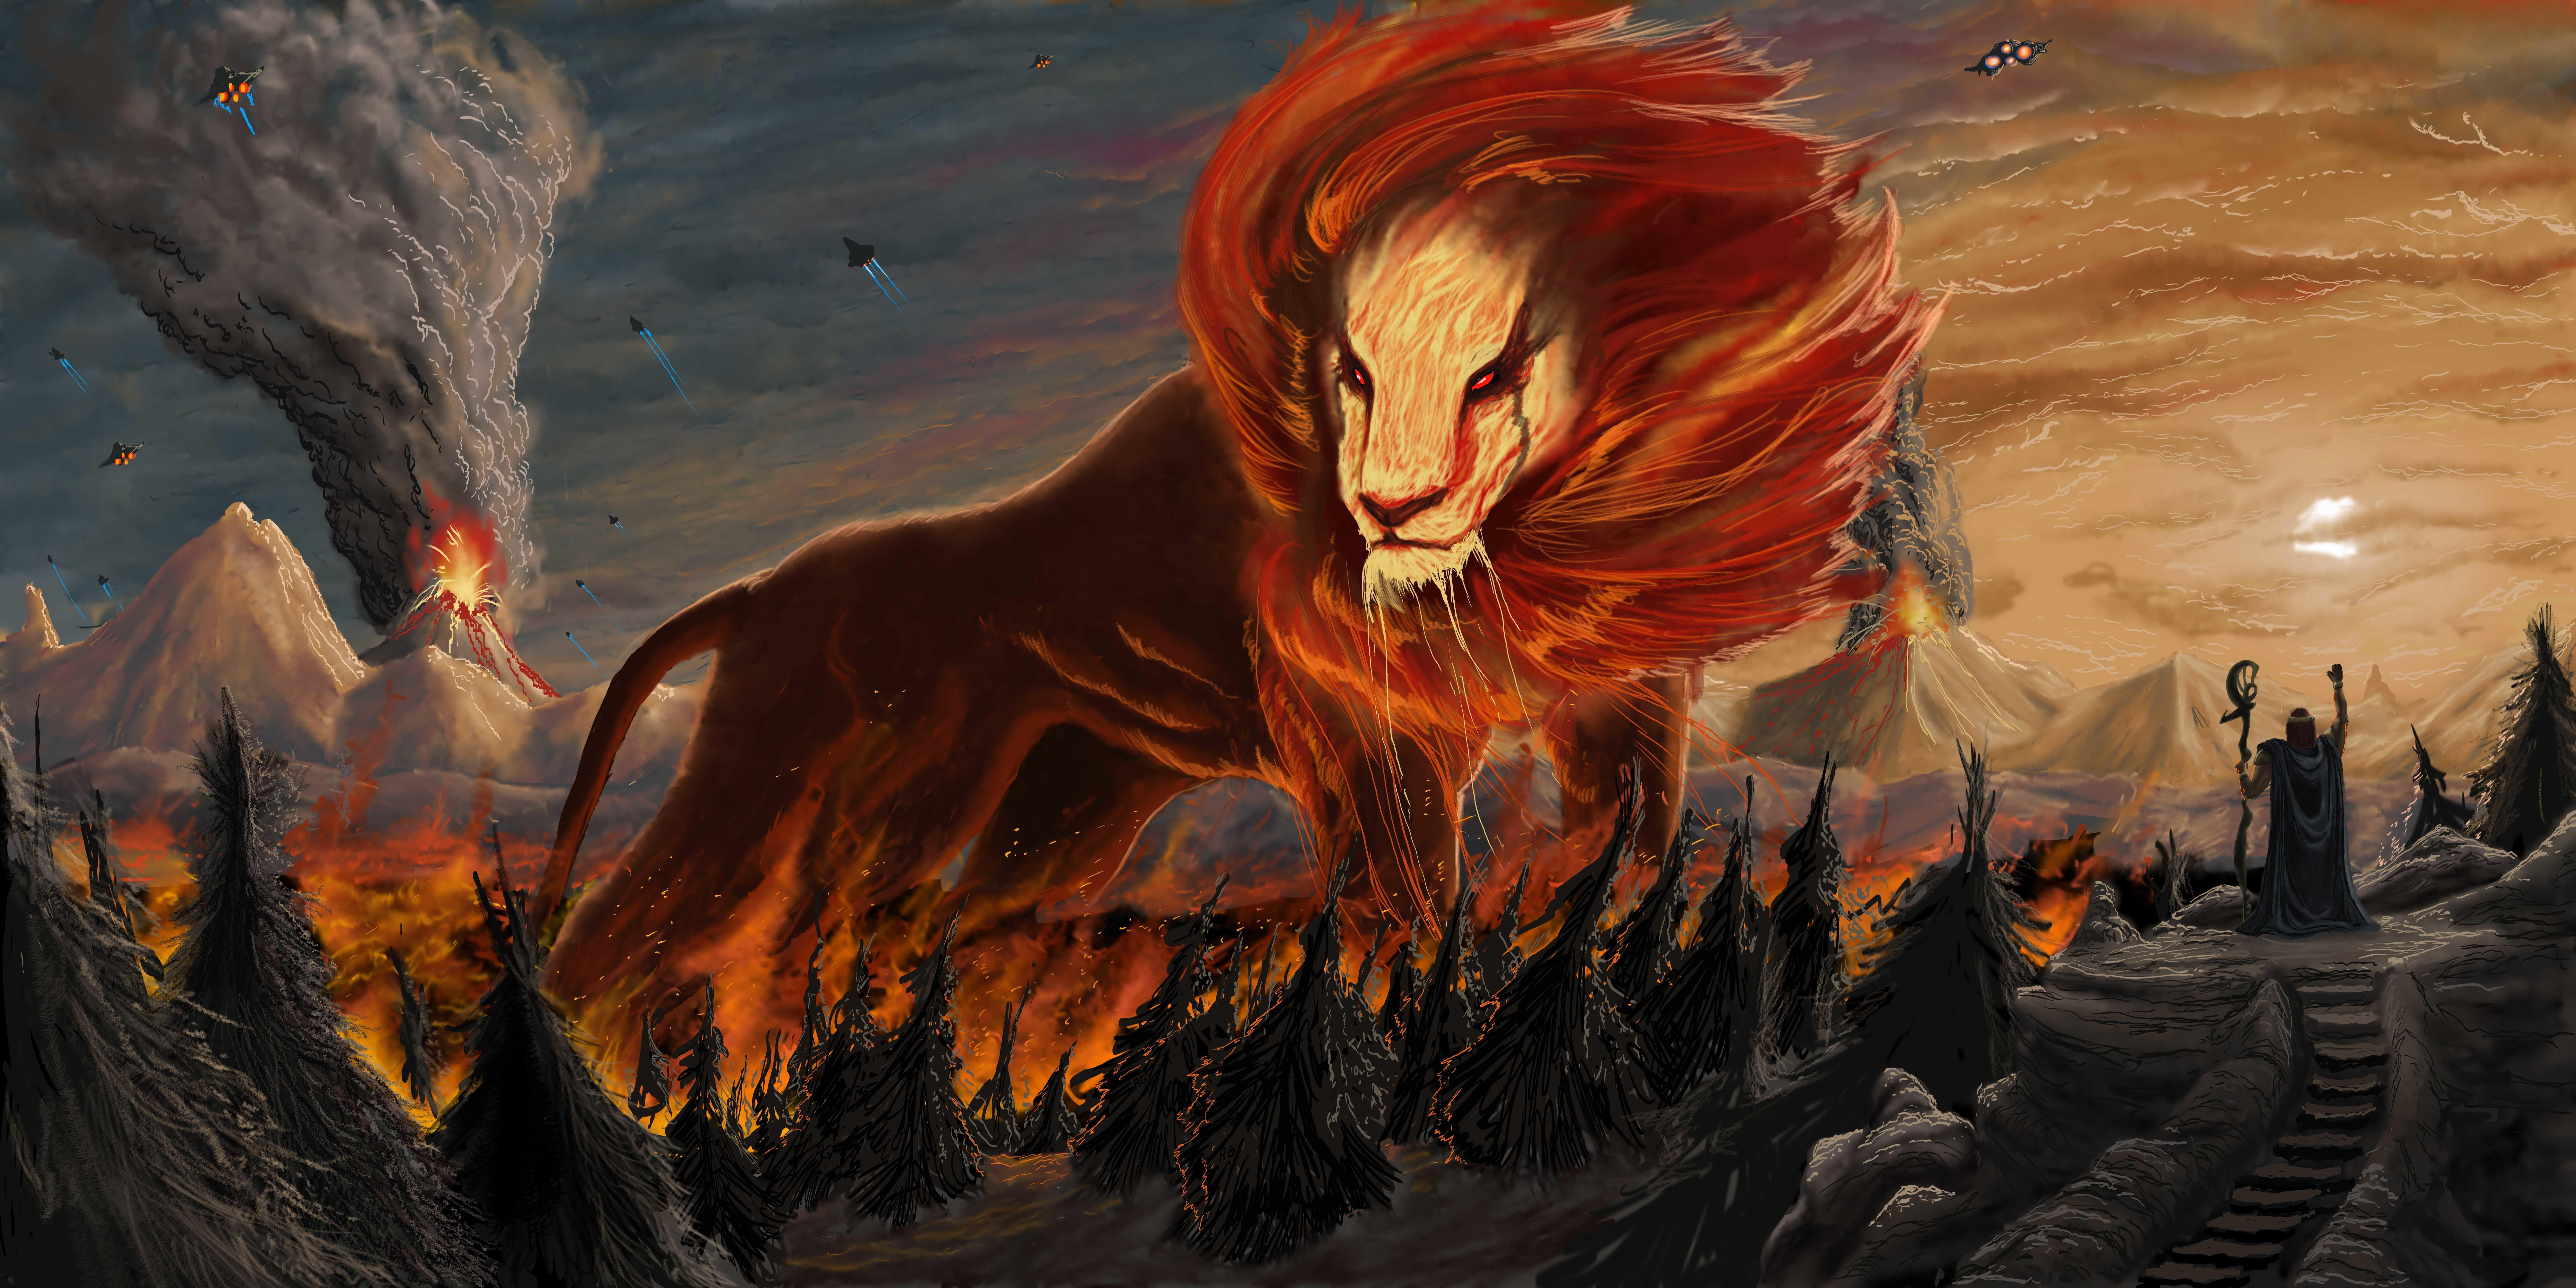 7680x4320 lion flames scifi abstract explosion 10k 8k hd - Lion 4k wallpaper for mobile ...